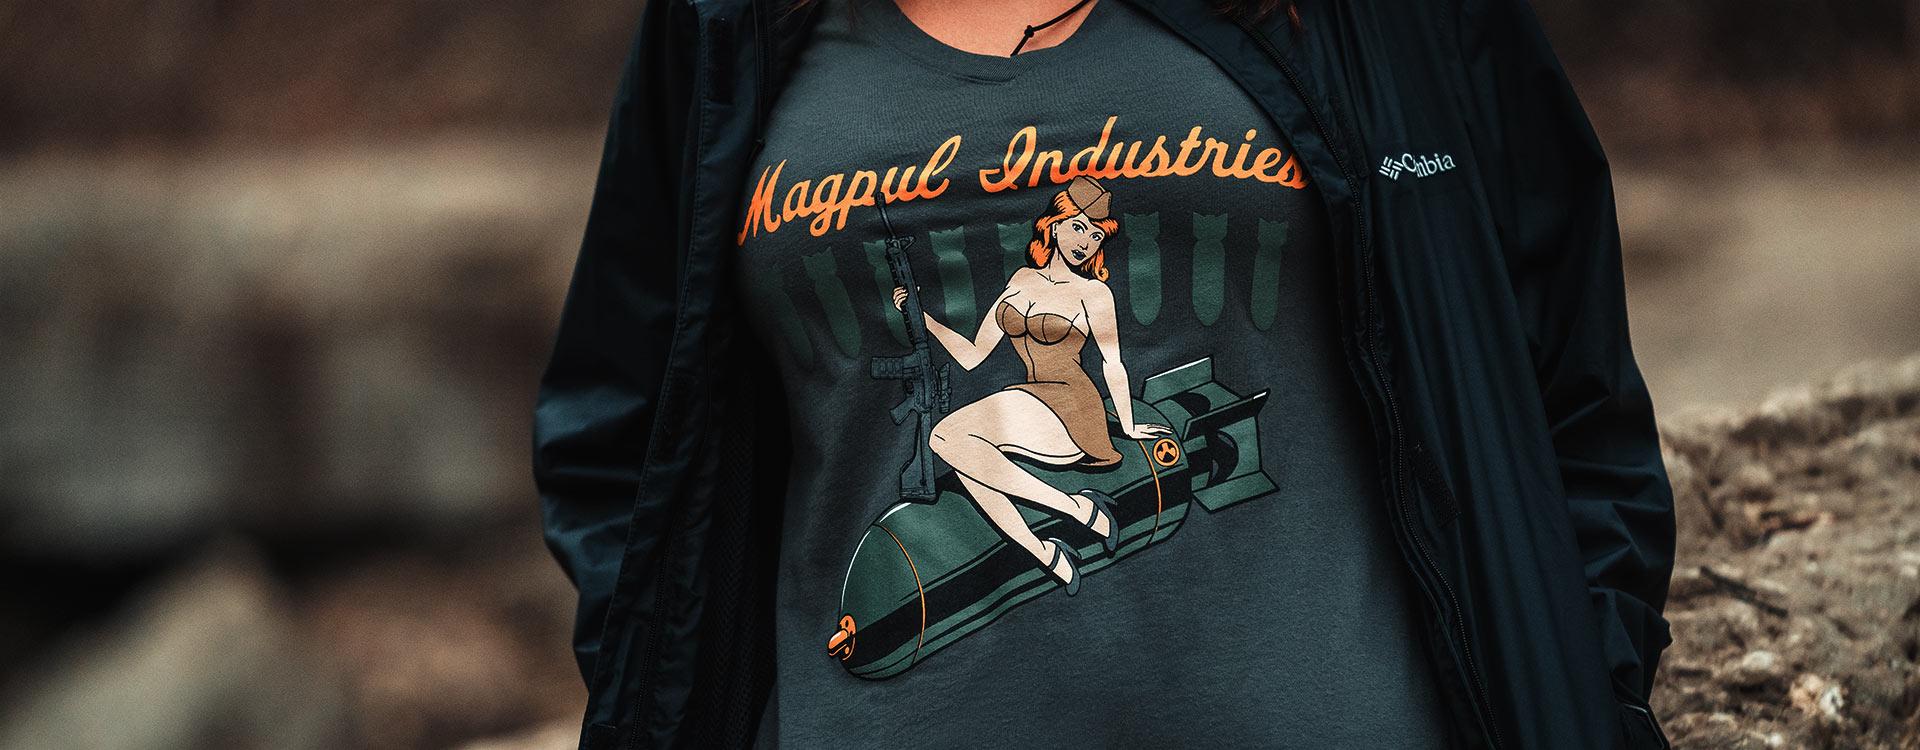 Magpul Women's Bombshell Cotton T-Shirt on woman outdoors wearing an unzipped jacket